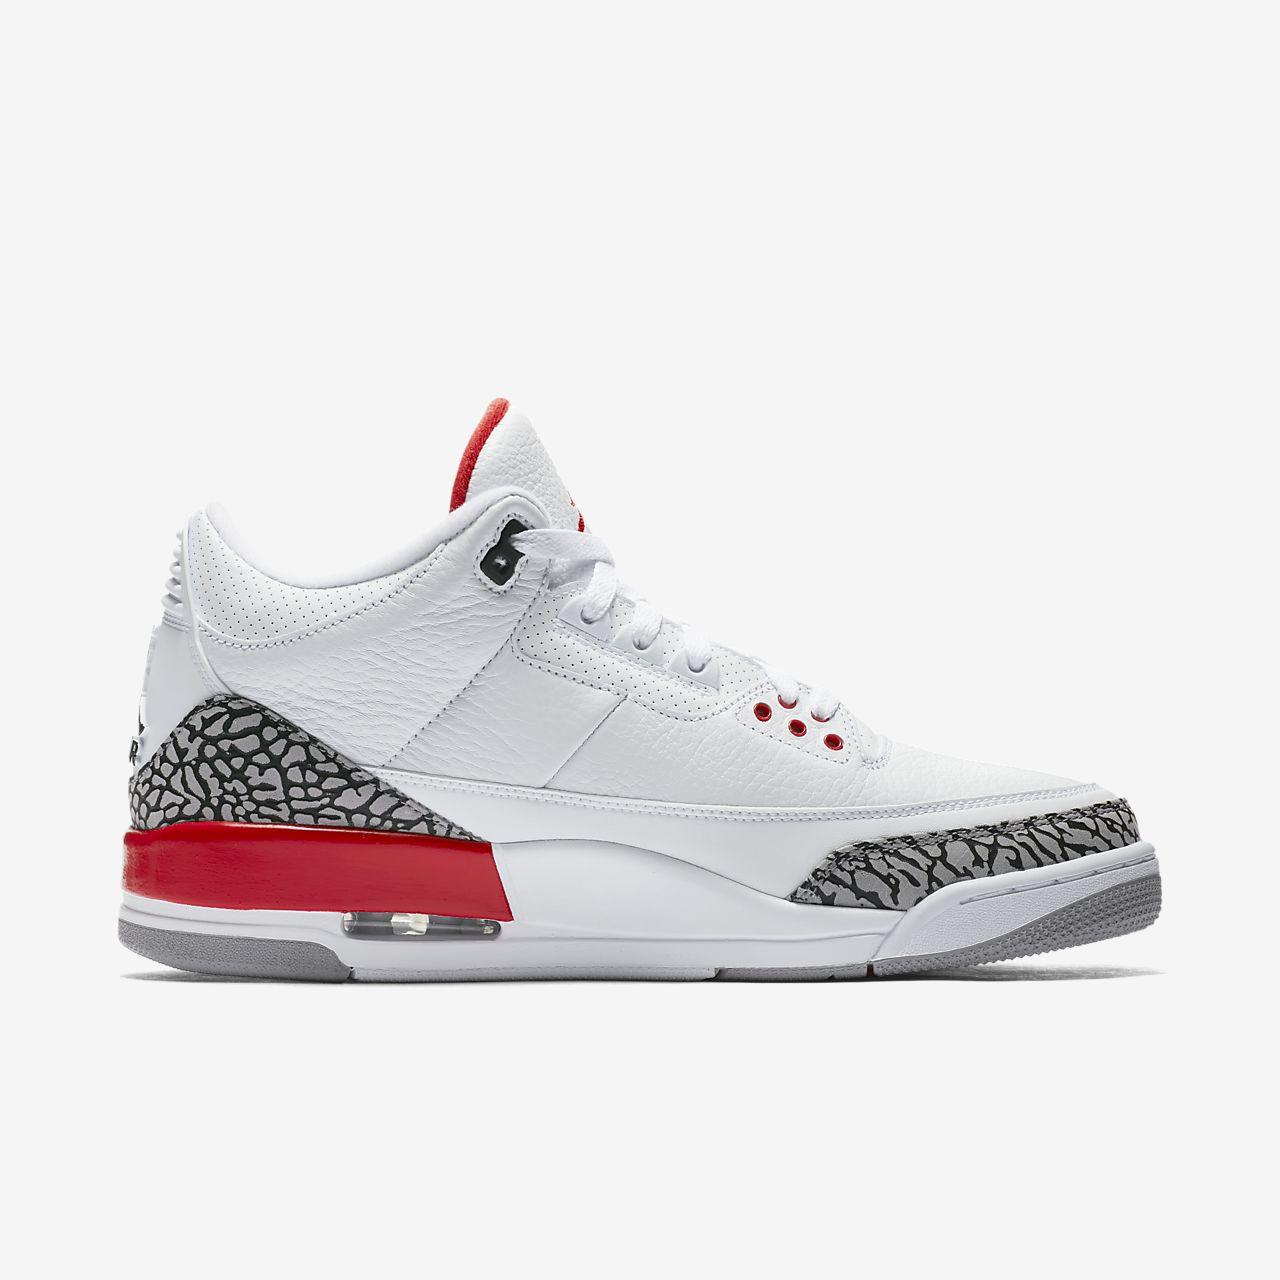 check out 0b262 777e1 Air Jordan 3 Retro Men's Shoe